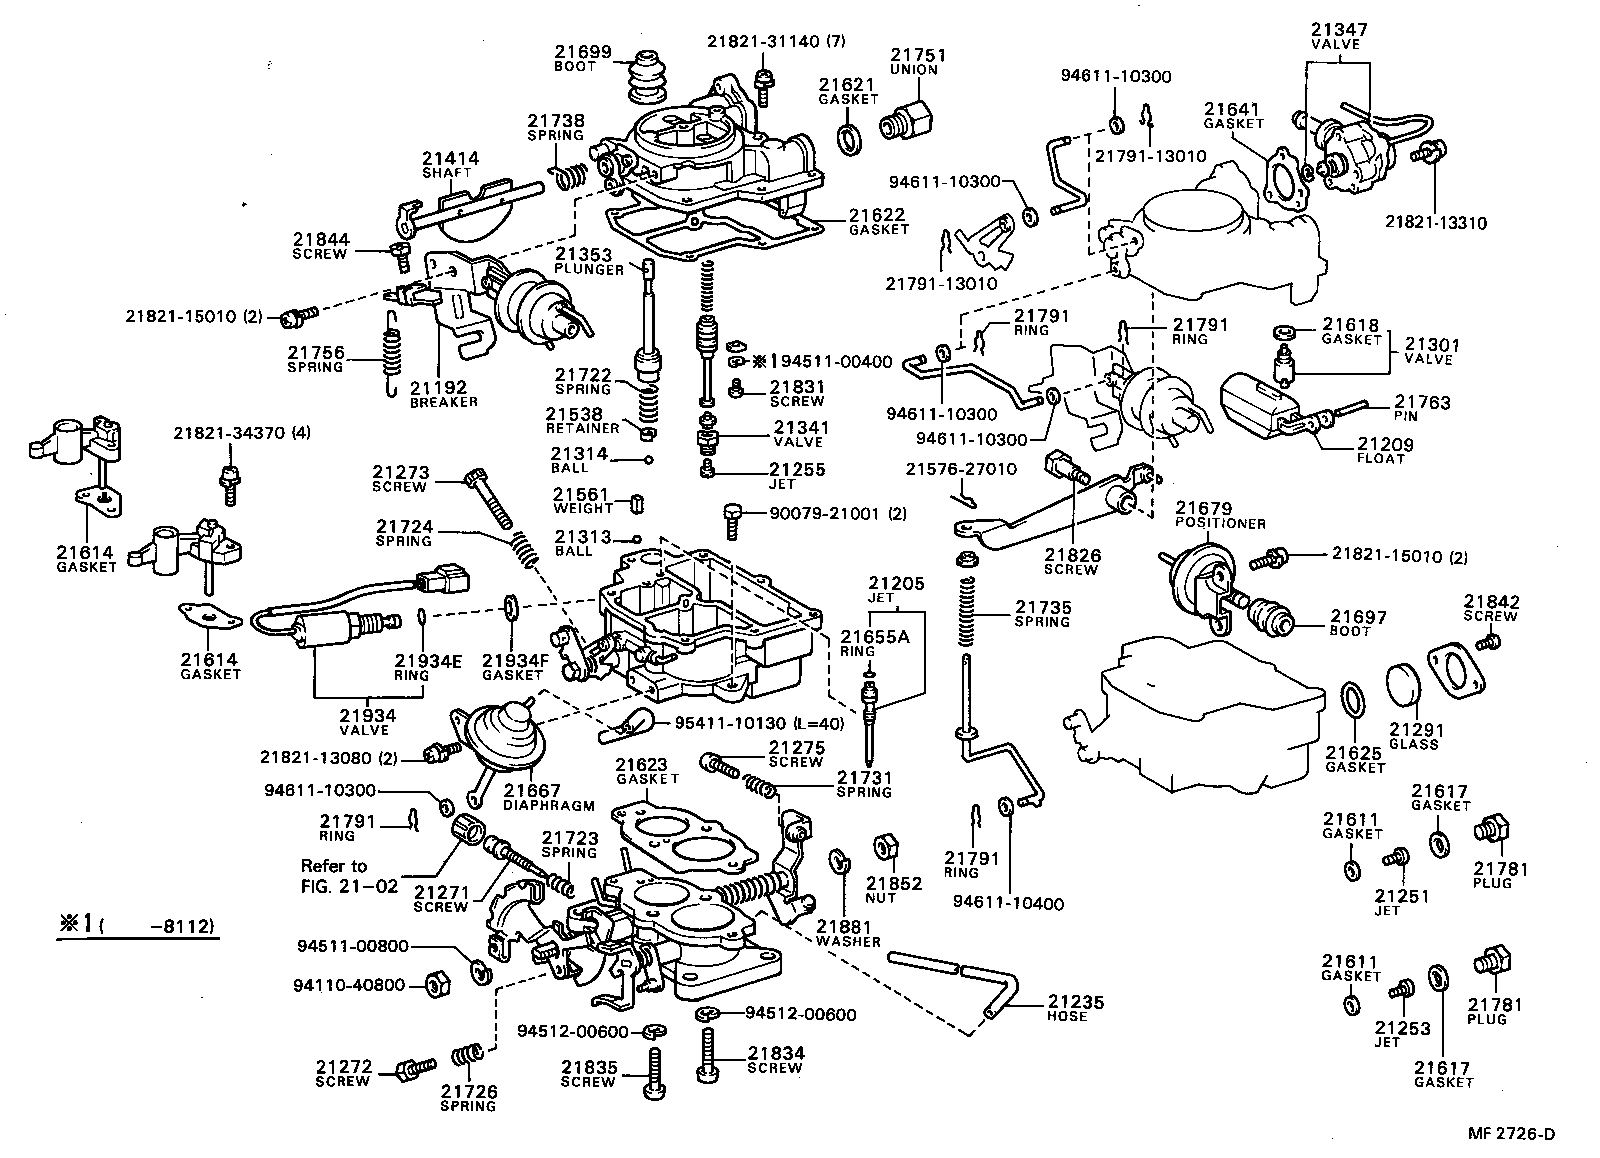 hight resolution of toyota corolla headlight diagram toyota free engine image for user 1984 toyota corolla engine diagram